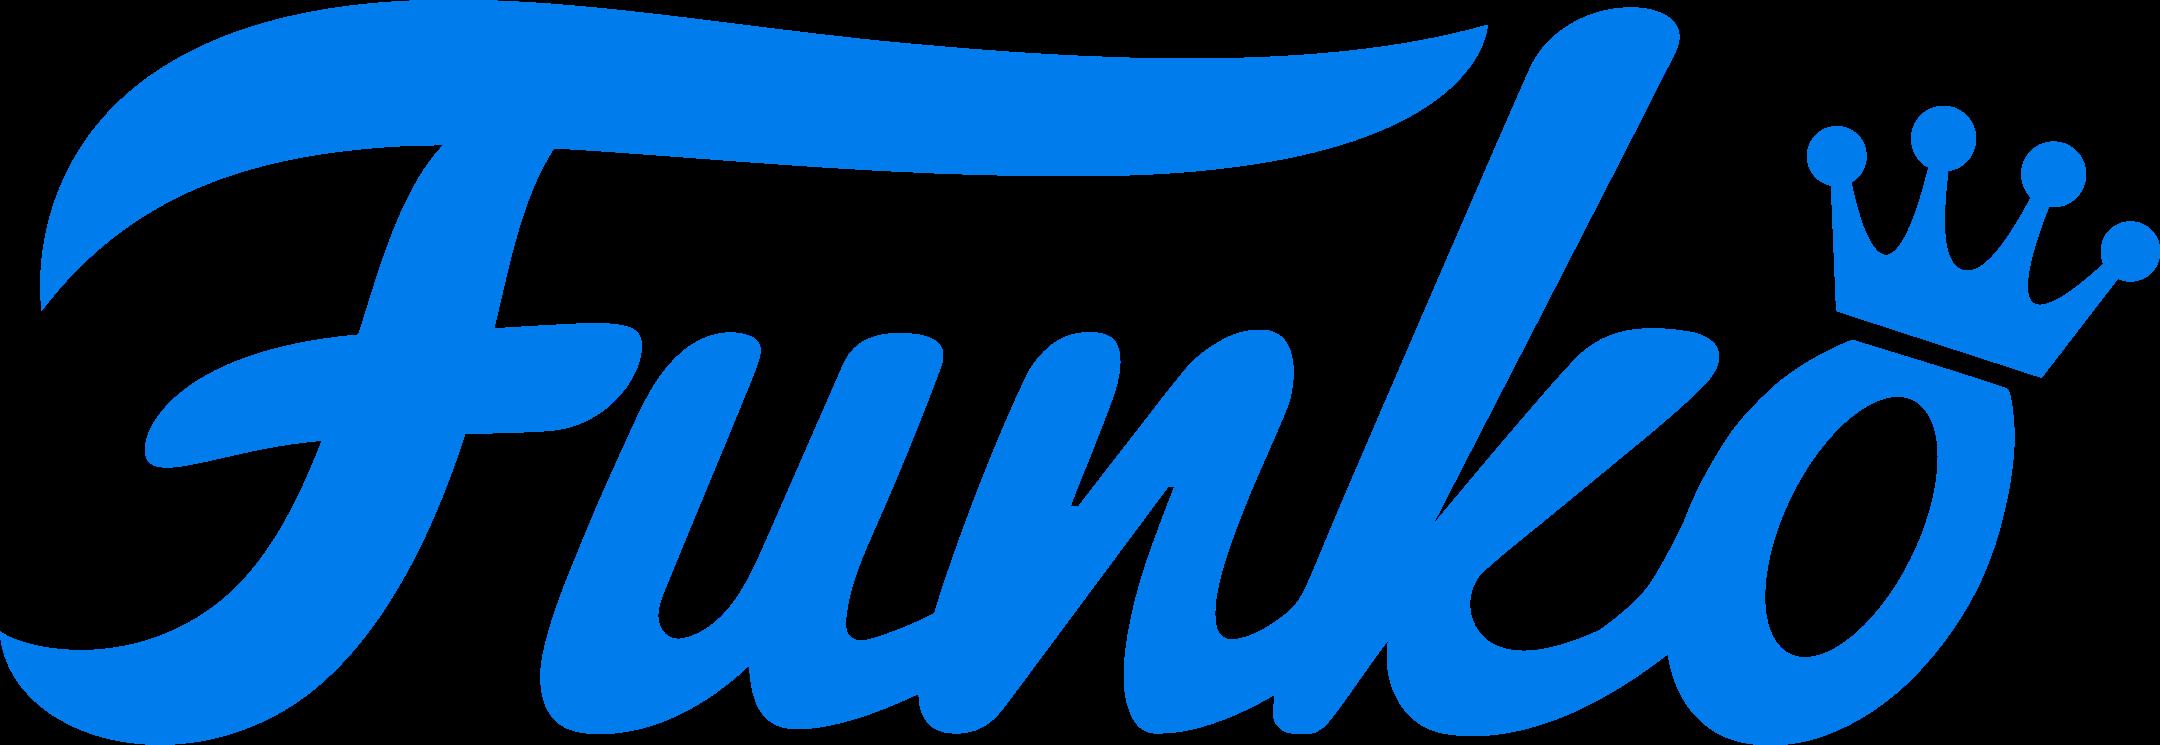 funko logo 3 - Funko Logo